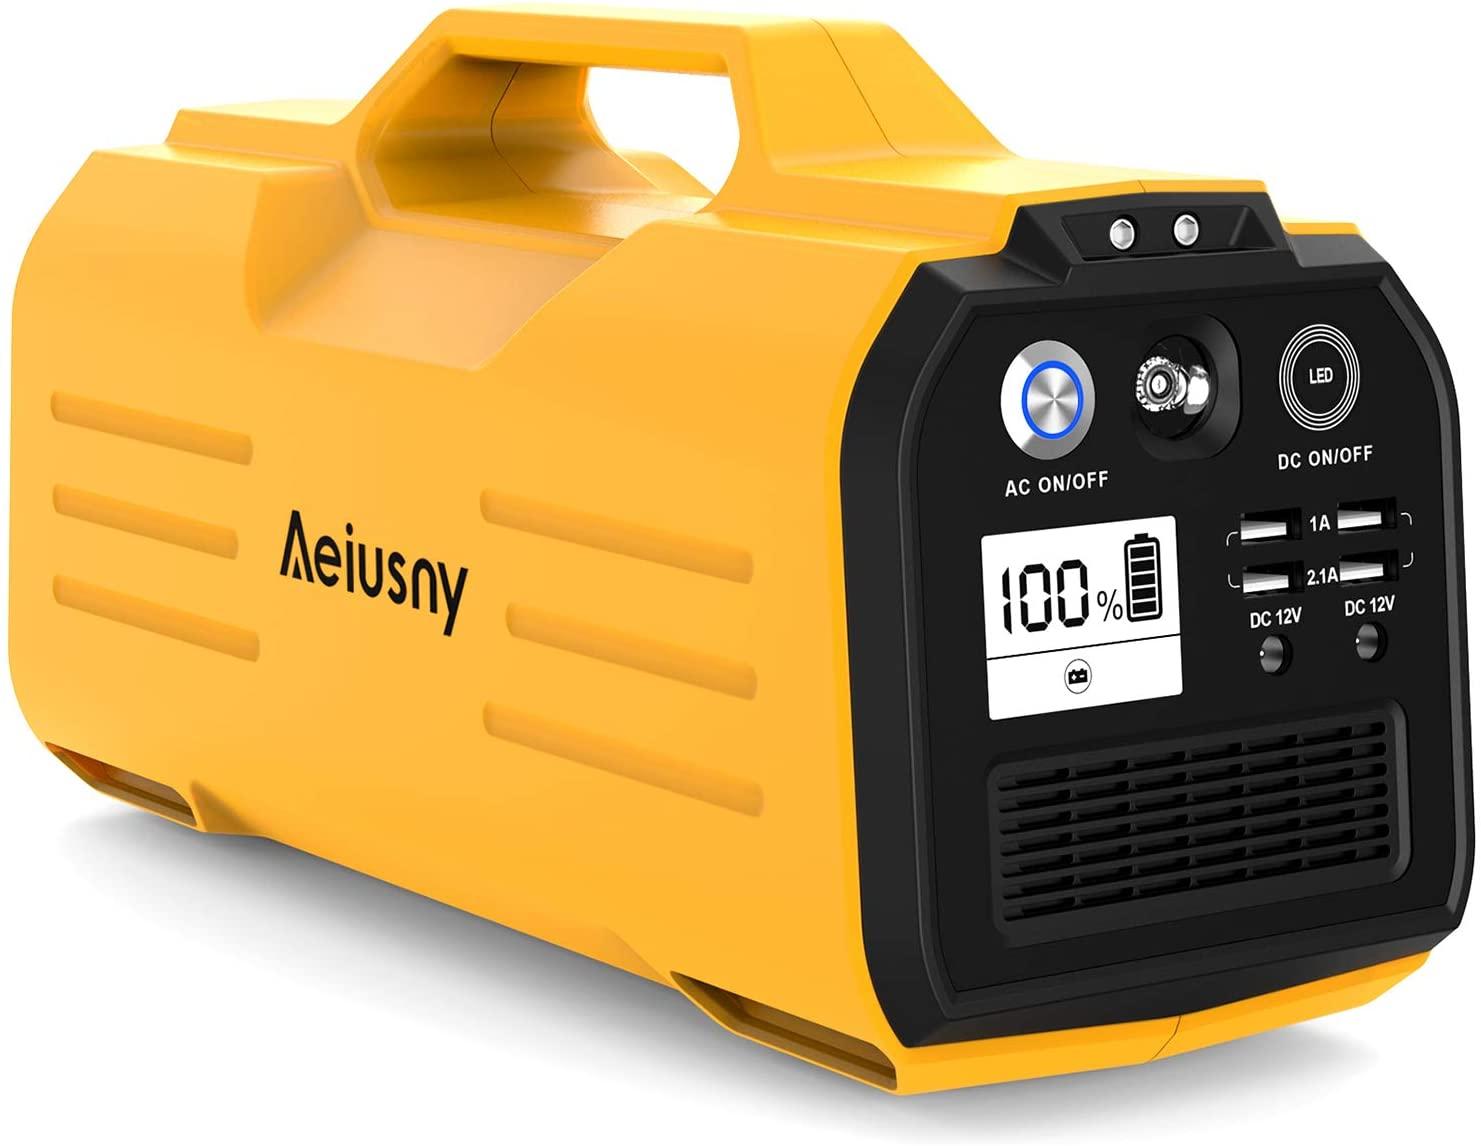 300W Aeiusny Portable Power Station